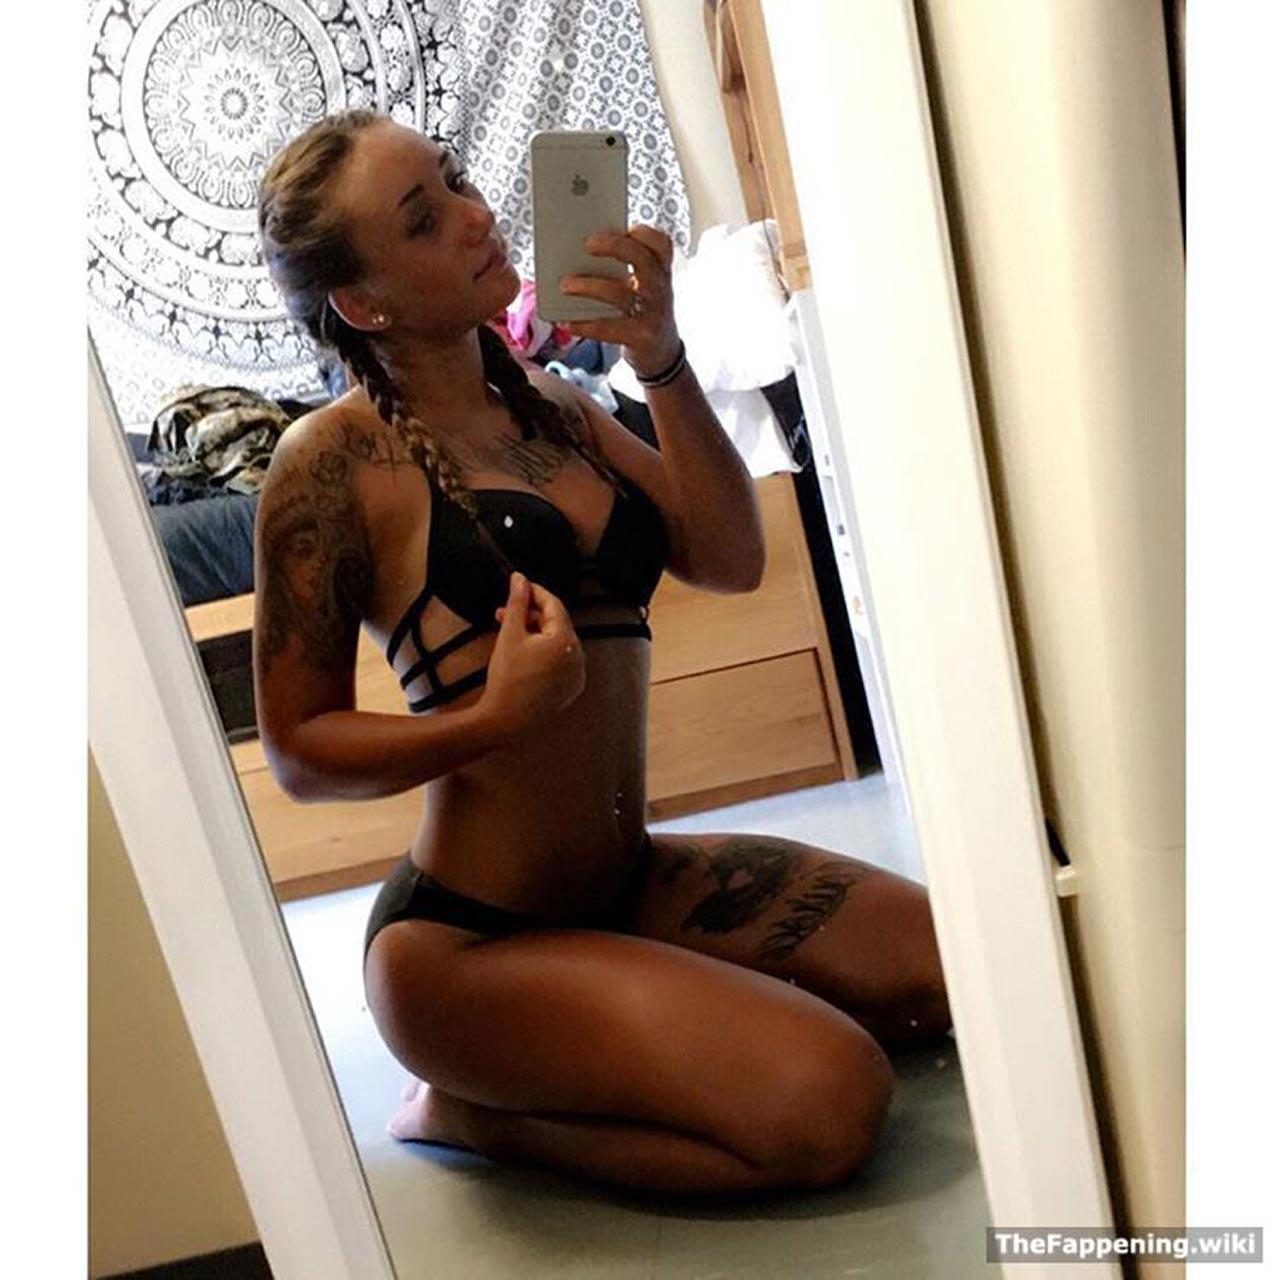 US marines nude scandal LEAKED photos